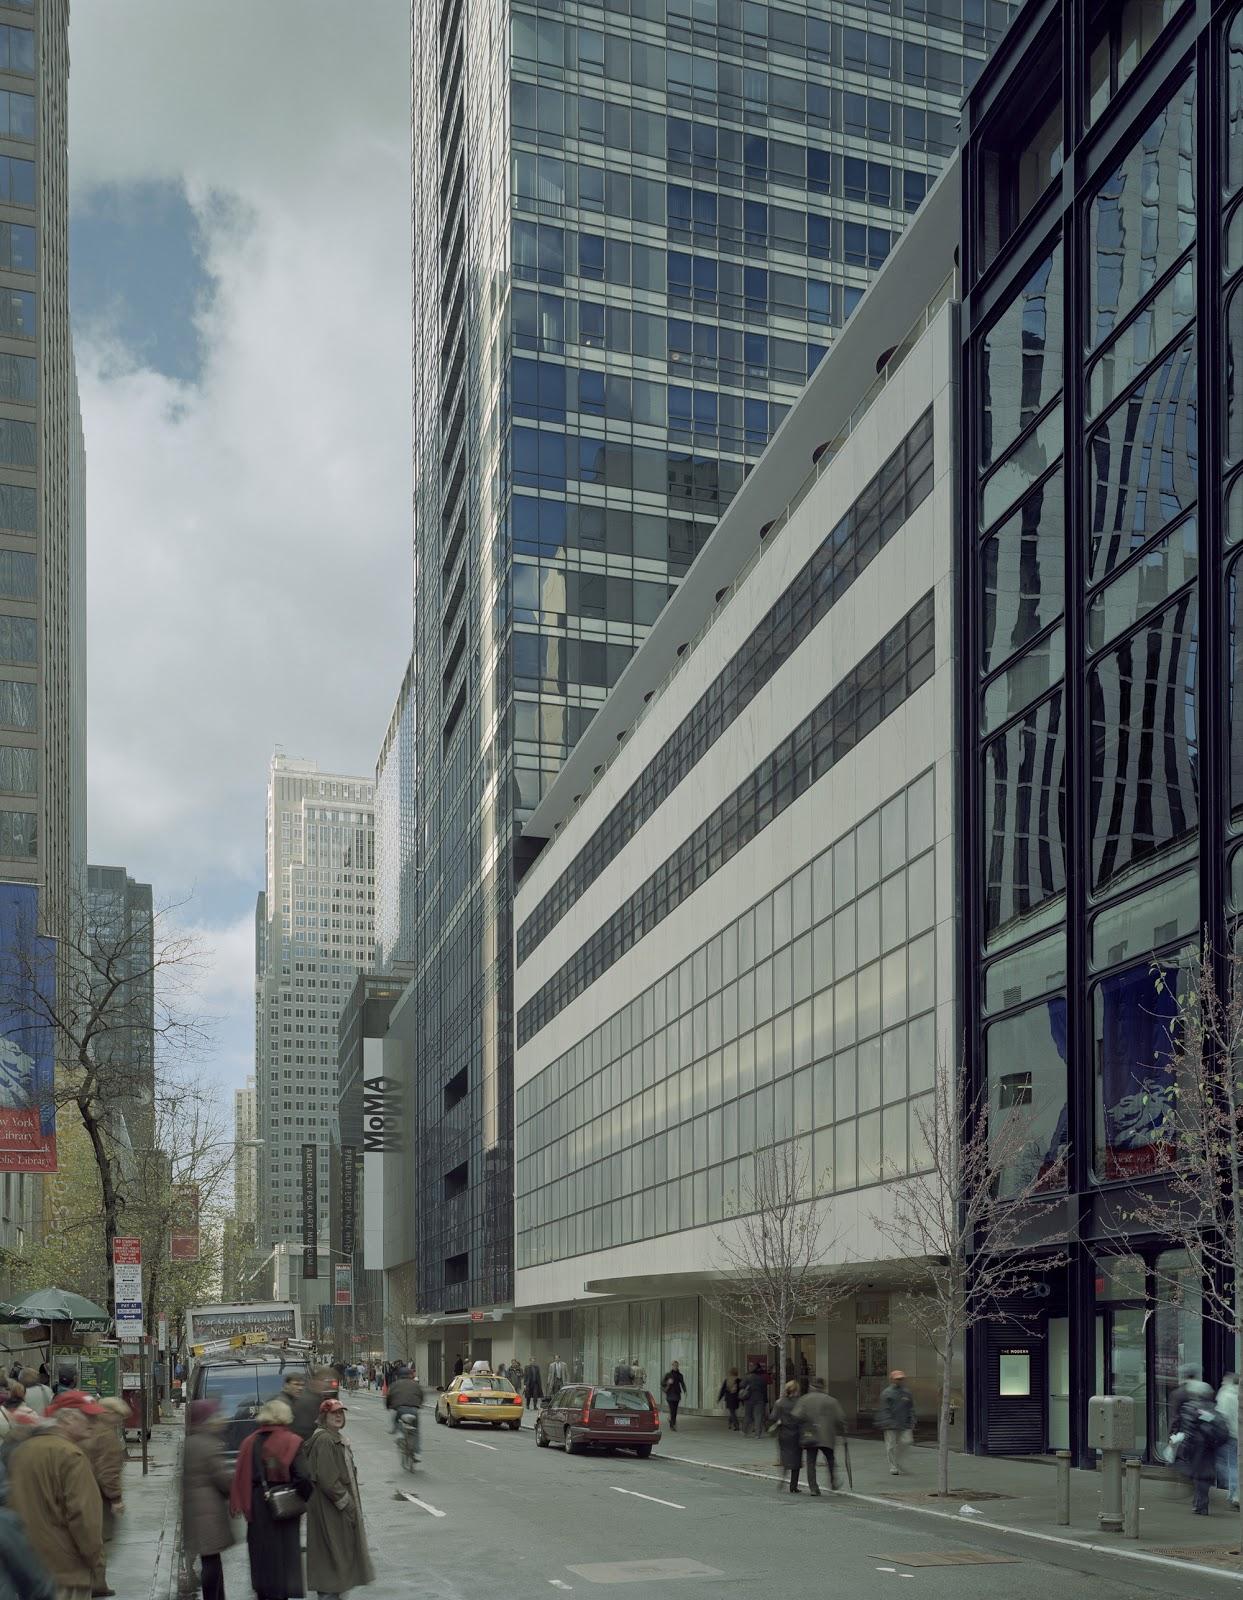 Timothy_Hursley_courtesy_MoMA_facade.jpg